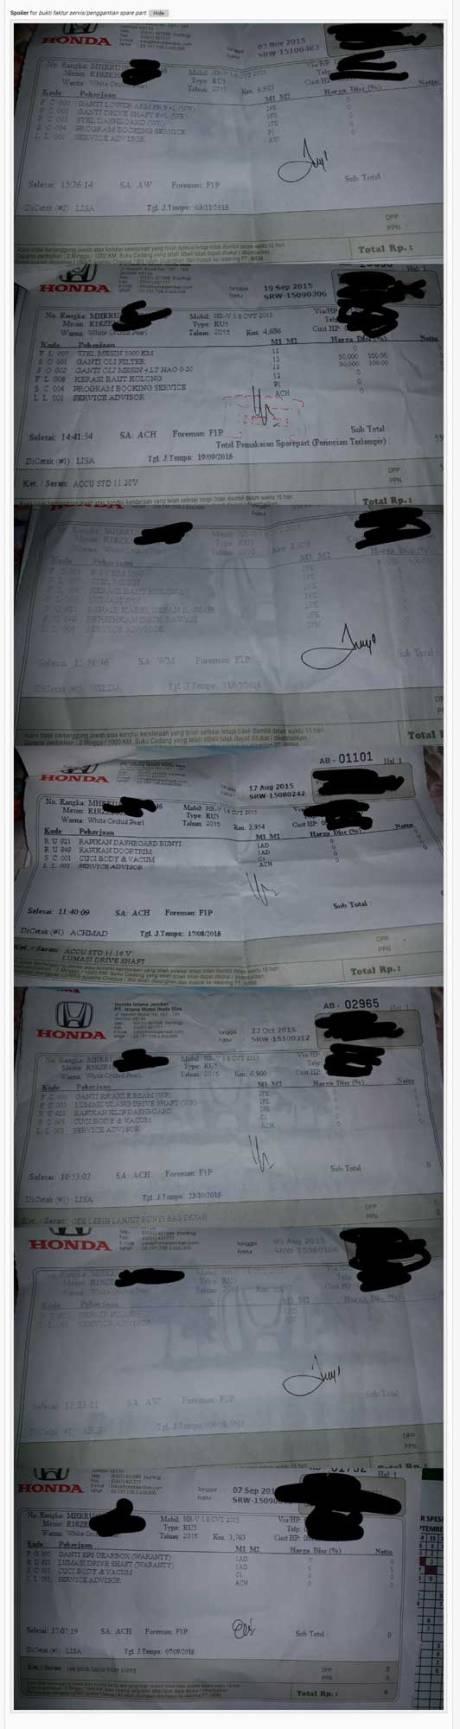 Keluhan Konsumen Honda HRV ini lagi ramai di Kaskus, moga cepat beres 02 Pertamax7.com